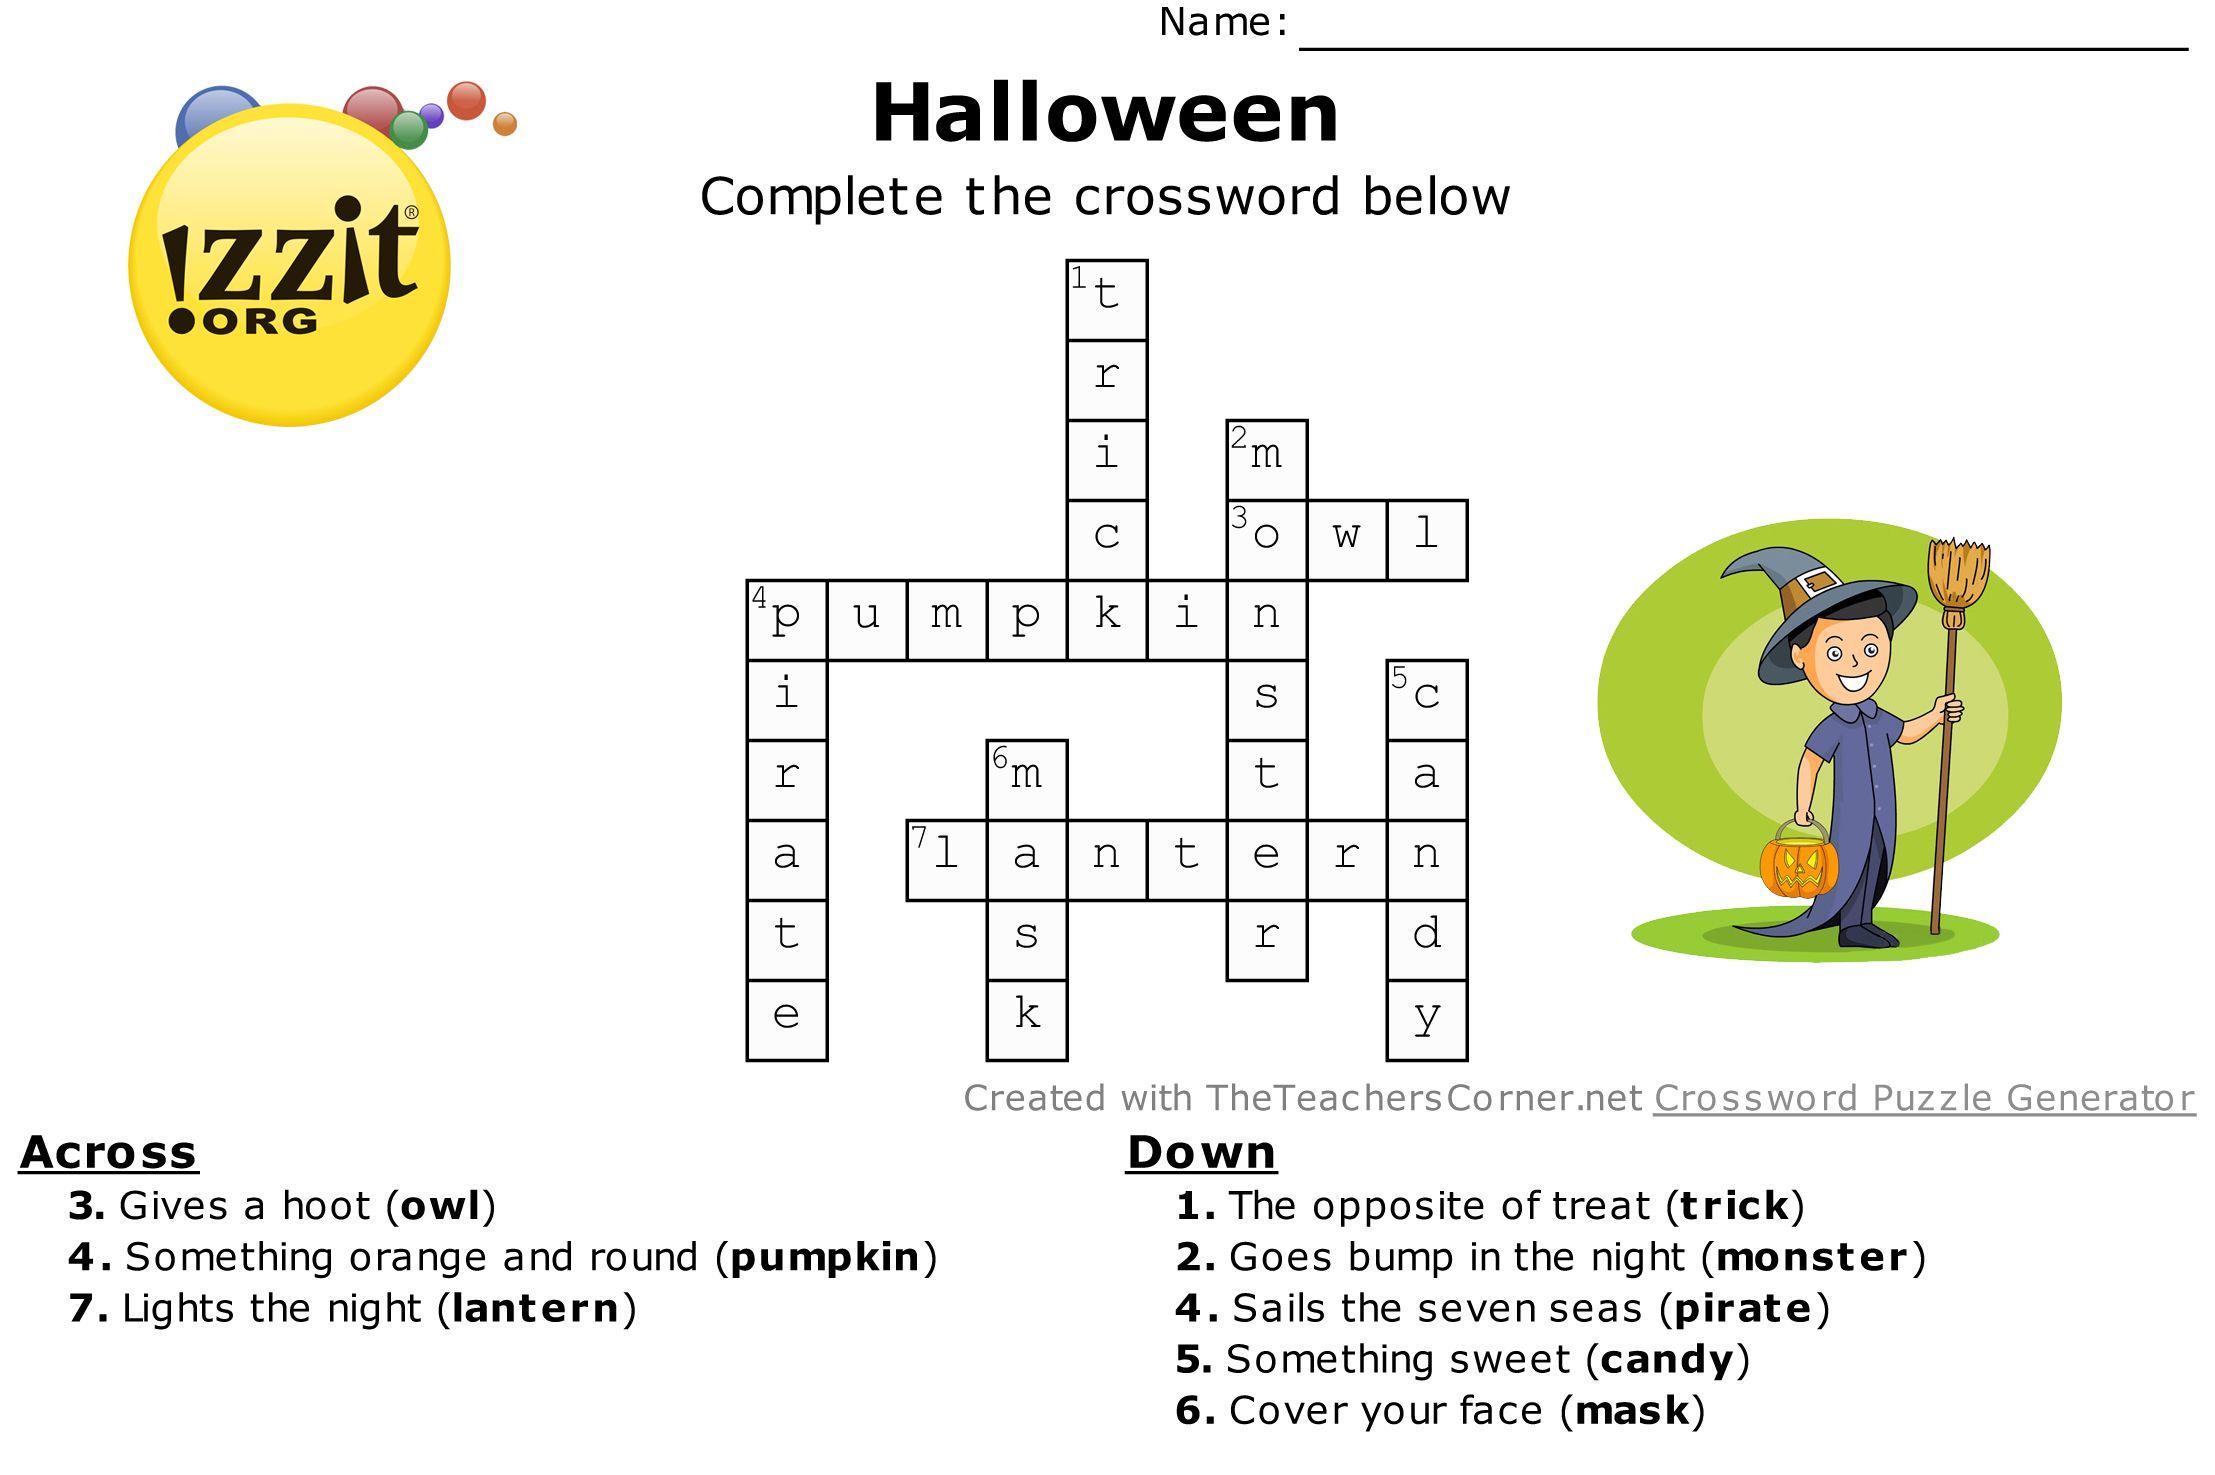 Halloween Crossword Answers Easy HappyHalloween